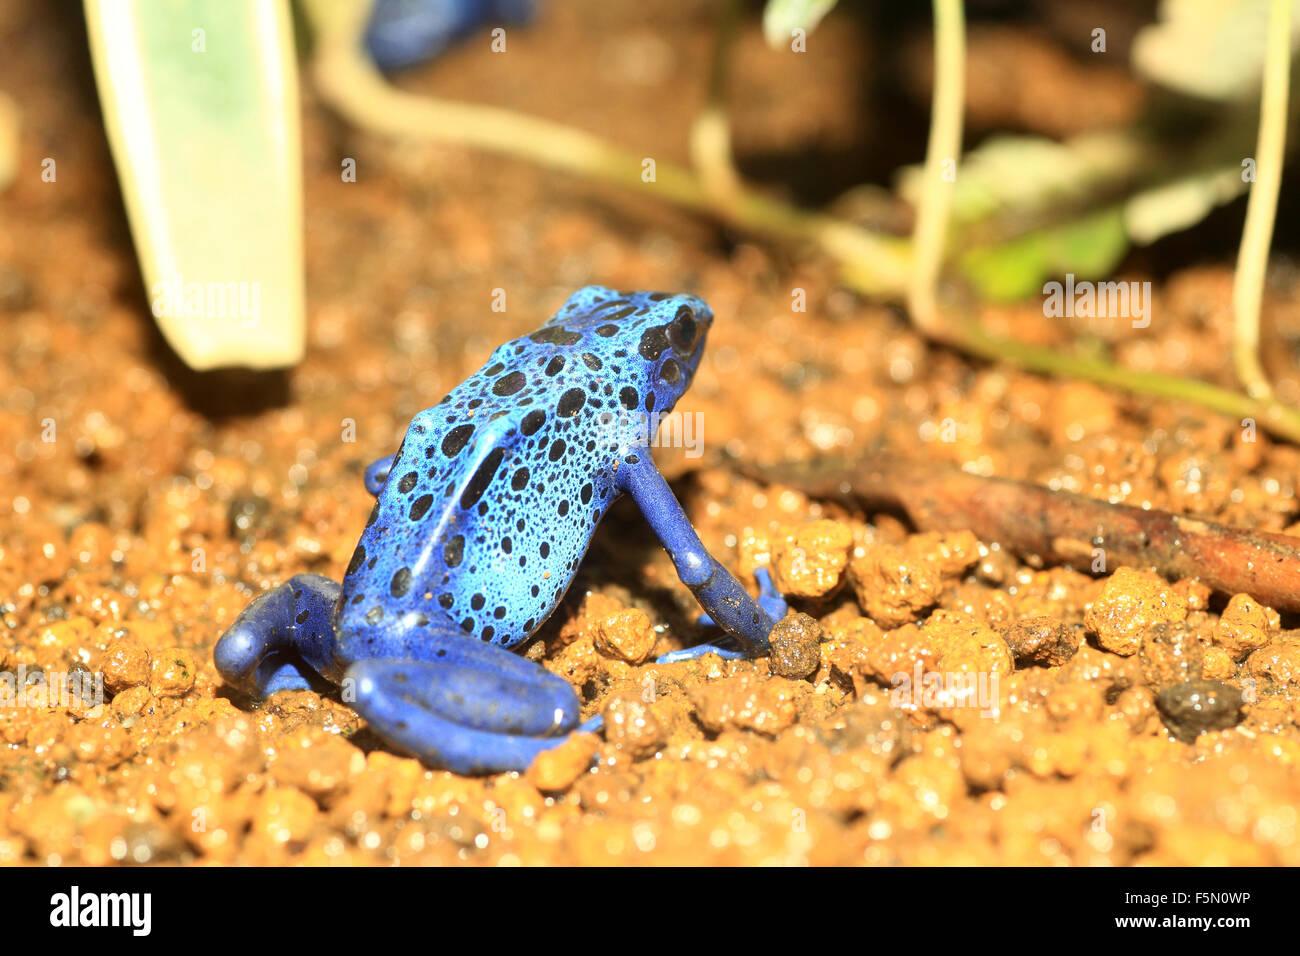 Blue Poison Dart Frog (Dendrobates azureus) in Republiek Suriname - Stock Image